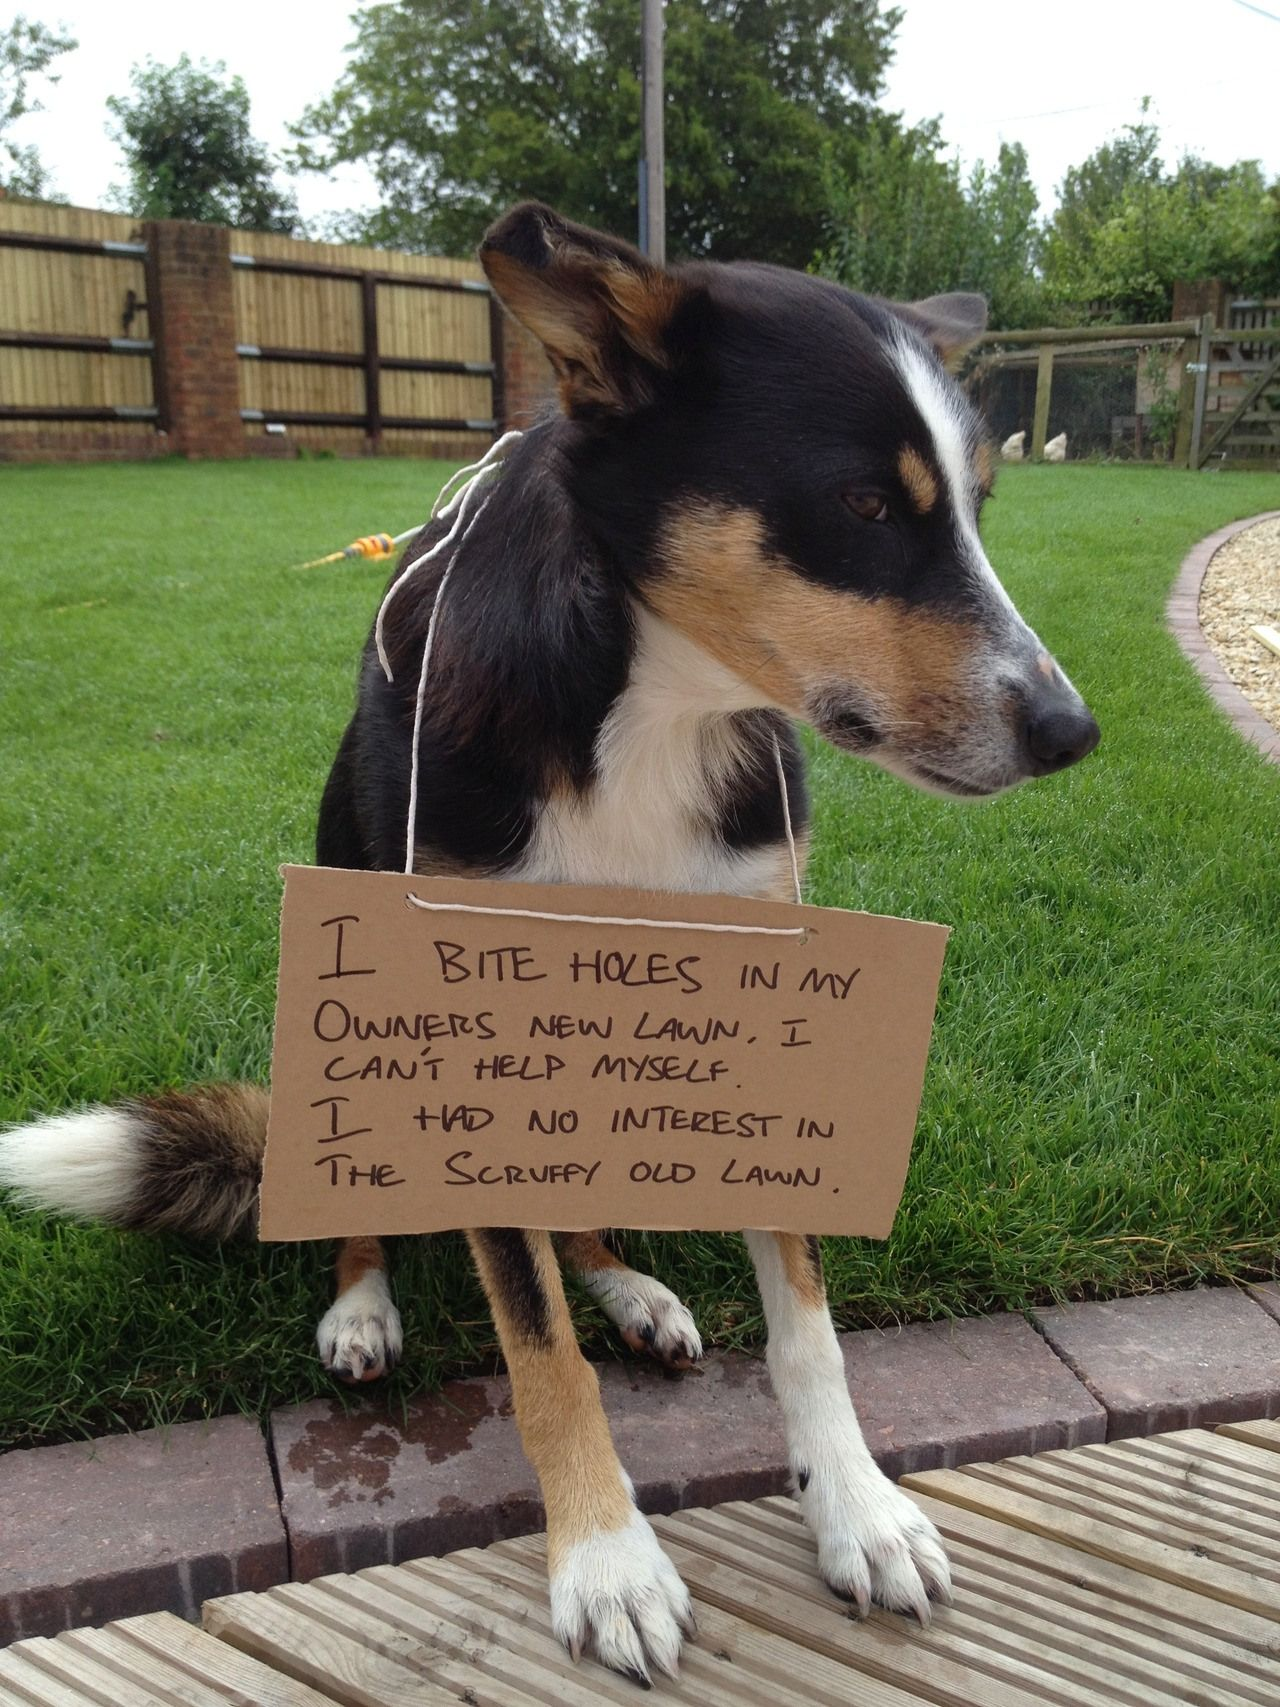 Can U Bury A Dog In Your Backyard - BACKYARD HOME